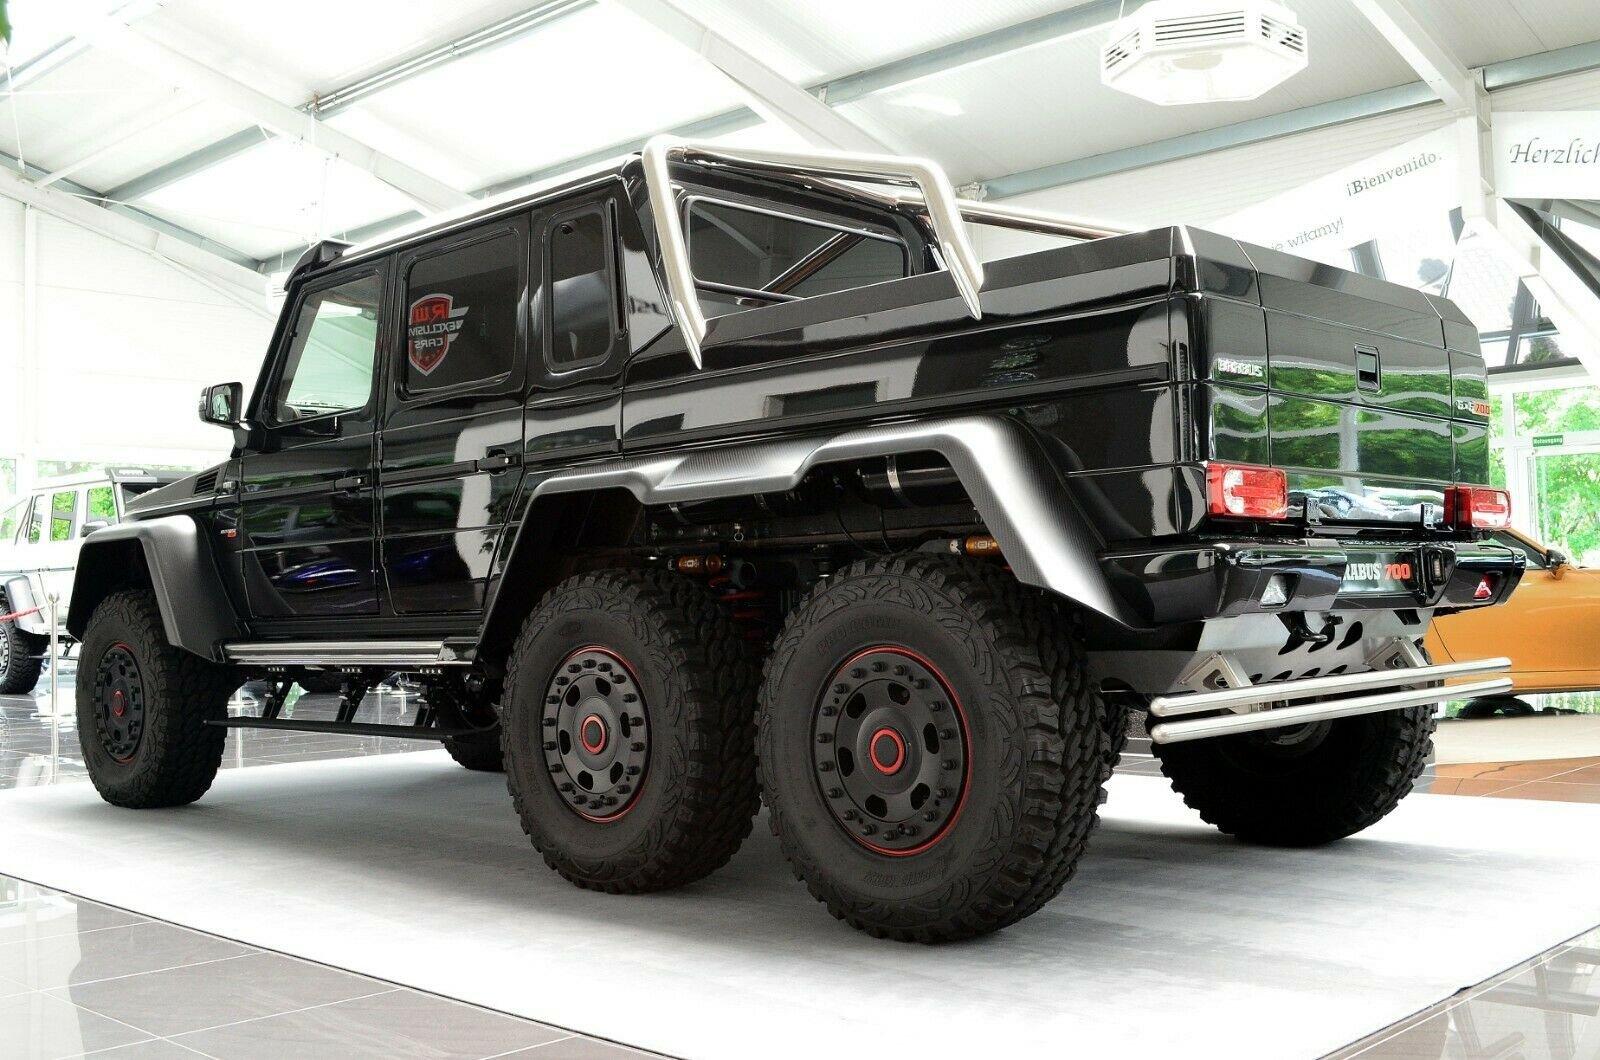 Mercedes-Benz G 63 AMG 6x6 Brabus700 - 1of15 (20)